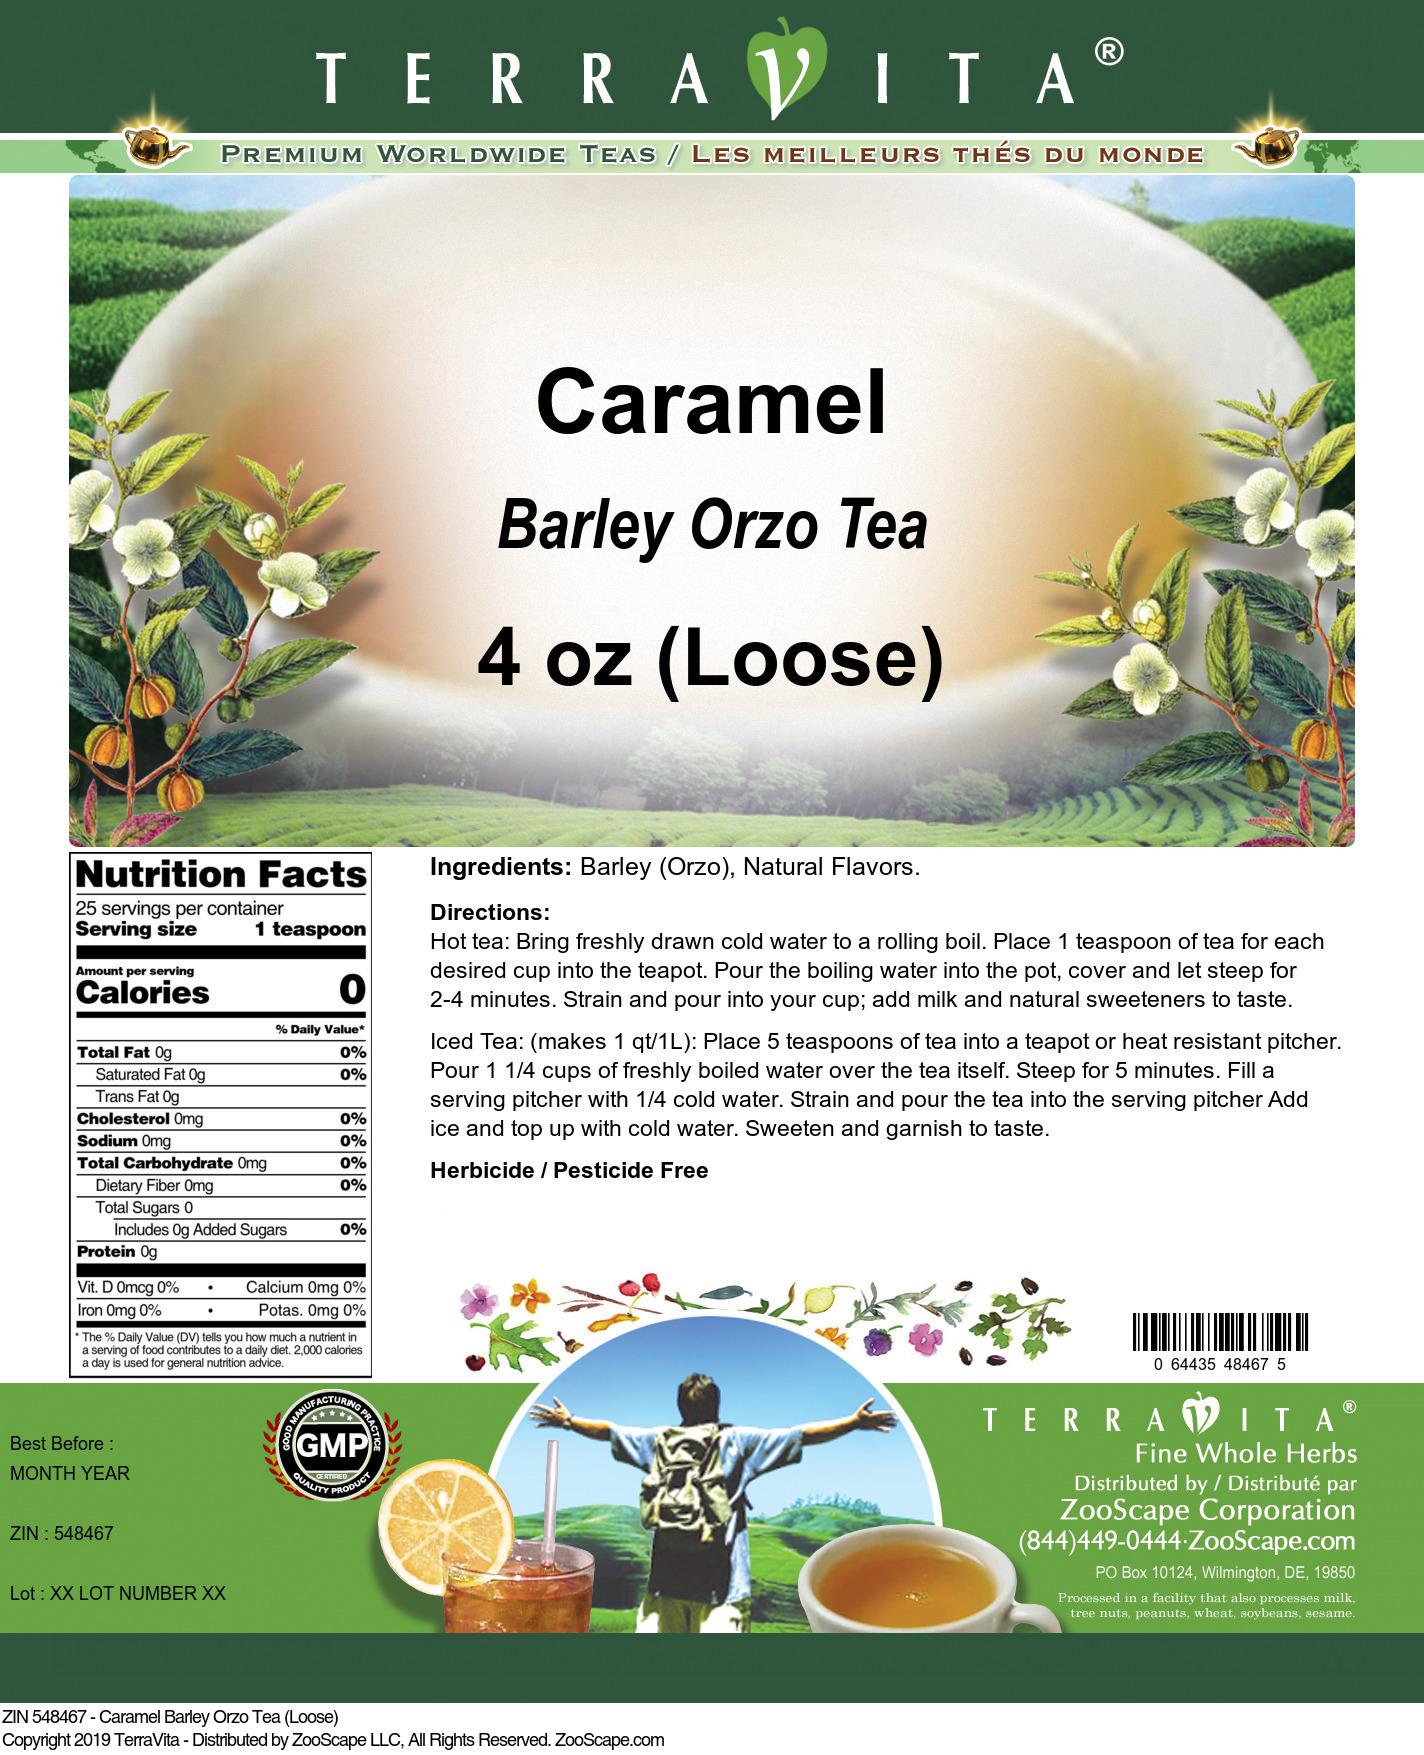 Caramel Barley Orzo Tea (Loose)